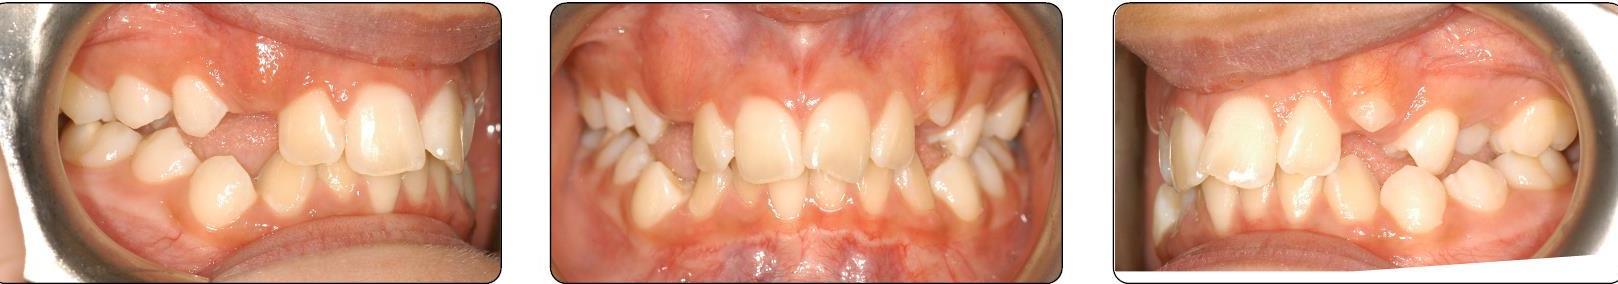 teeth before Phase 2